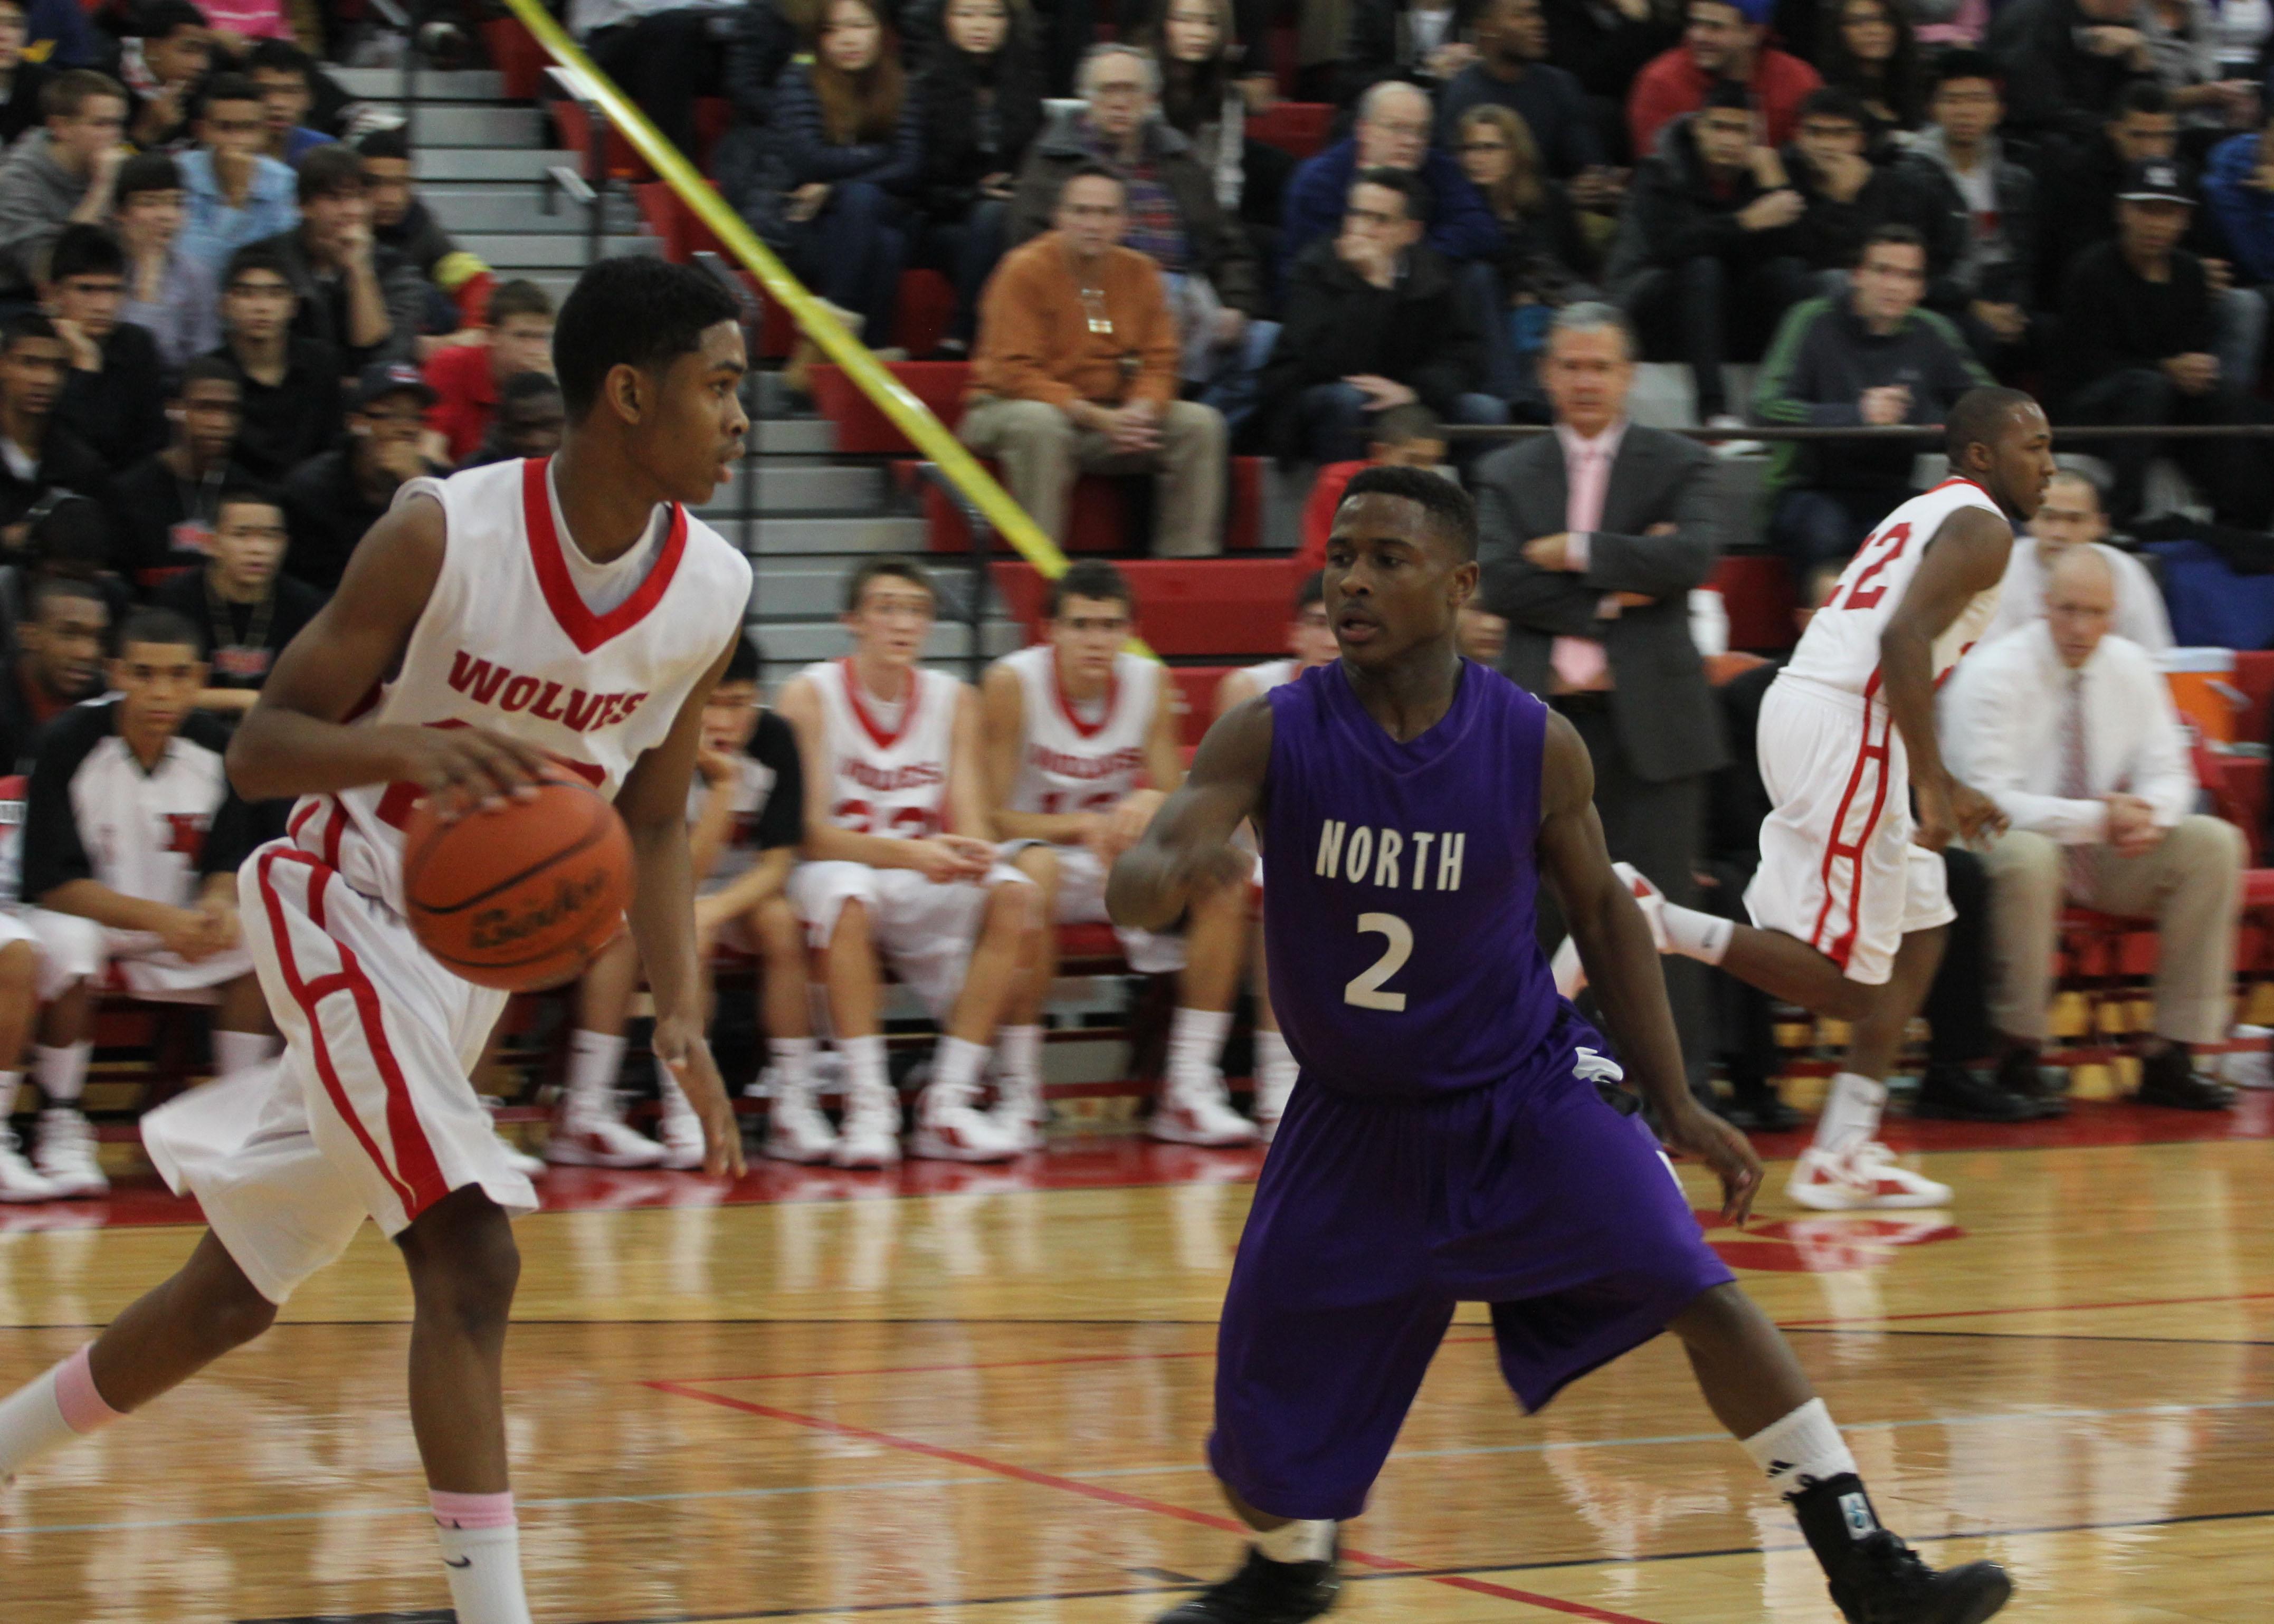 Boys Basketball: West vs. North